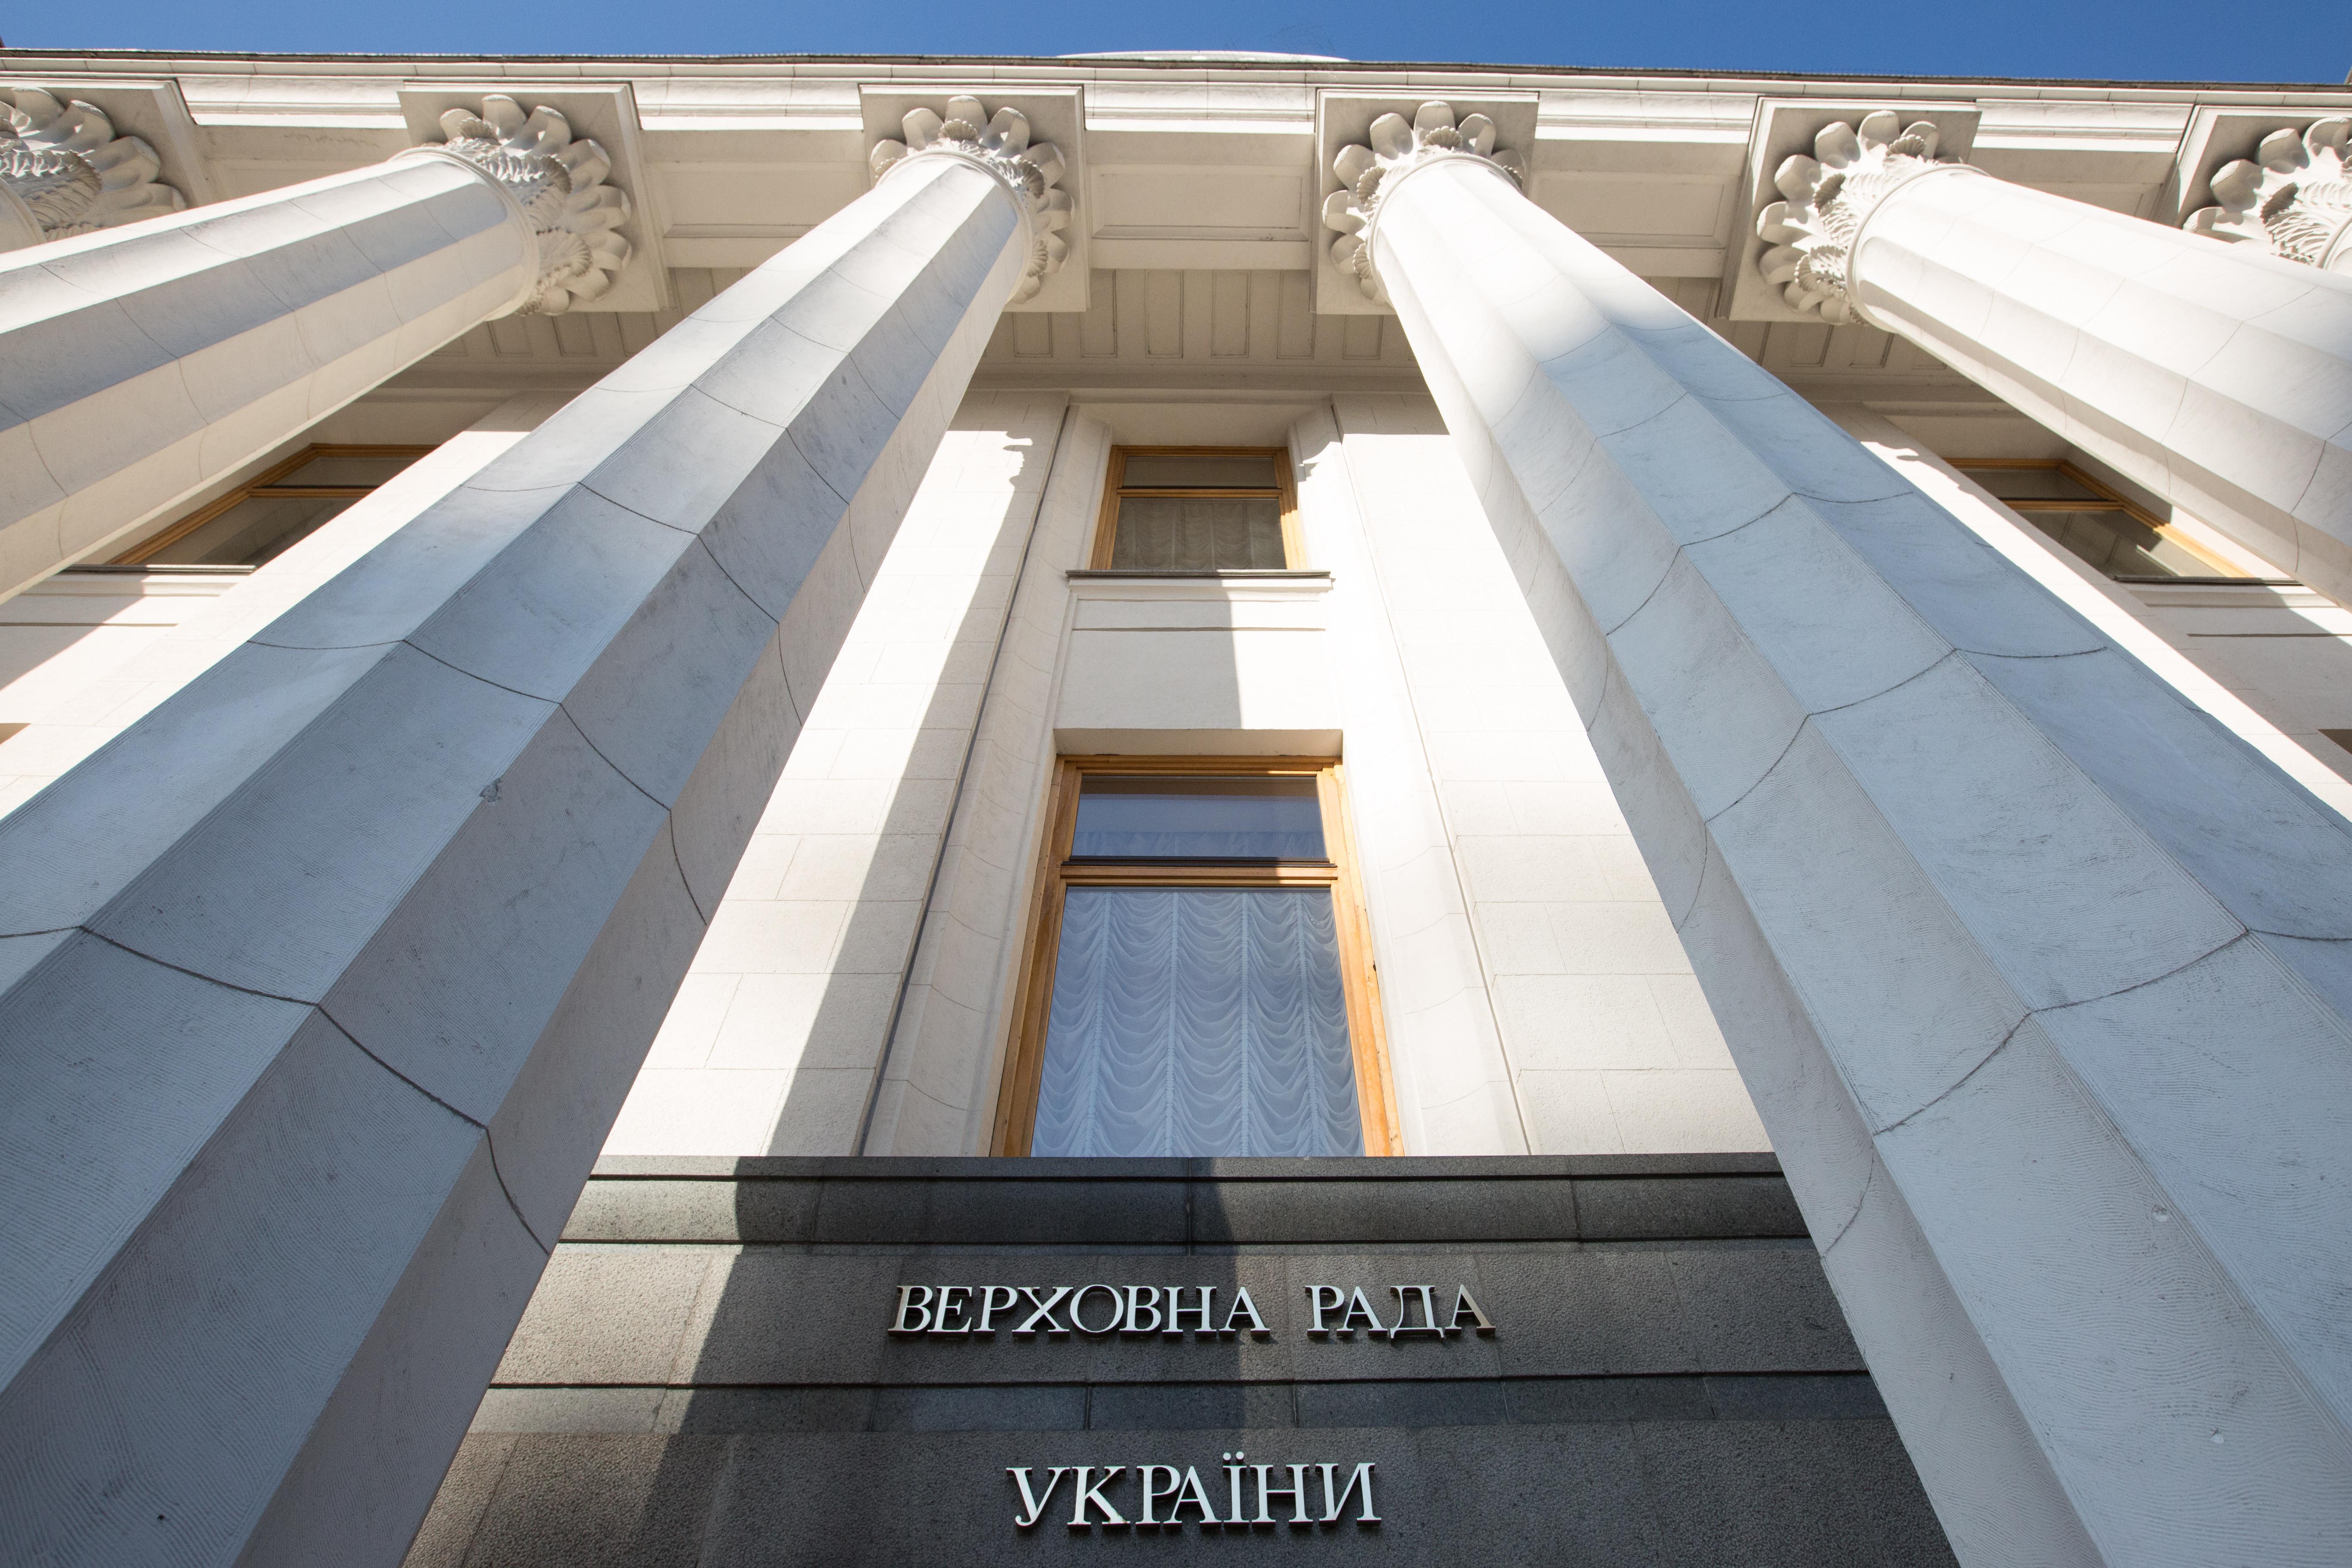 <p><span>Фото: &copy; РИА Новости</span></p> <div> <div> <div></div> </div> </div>